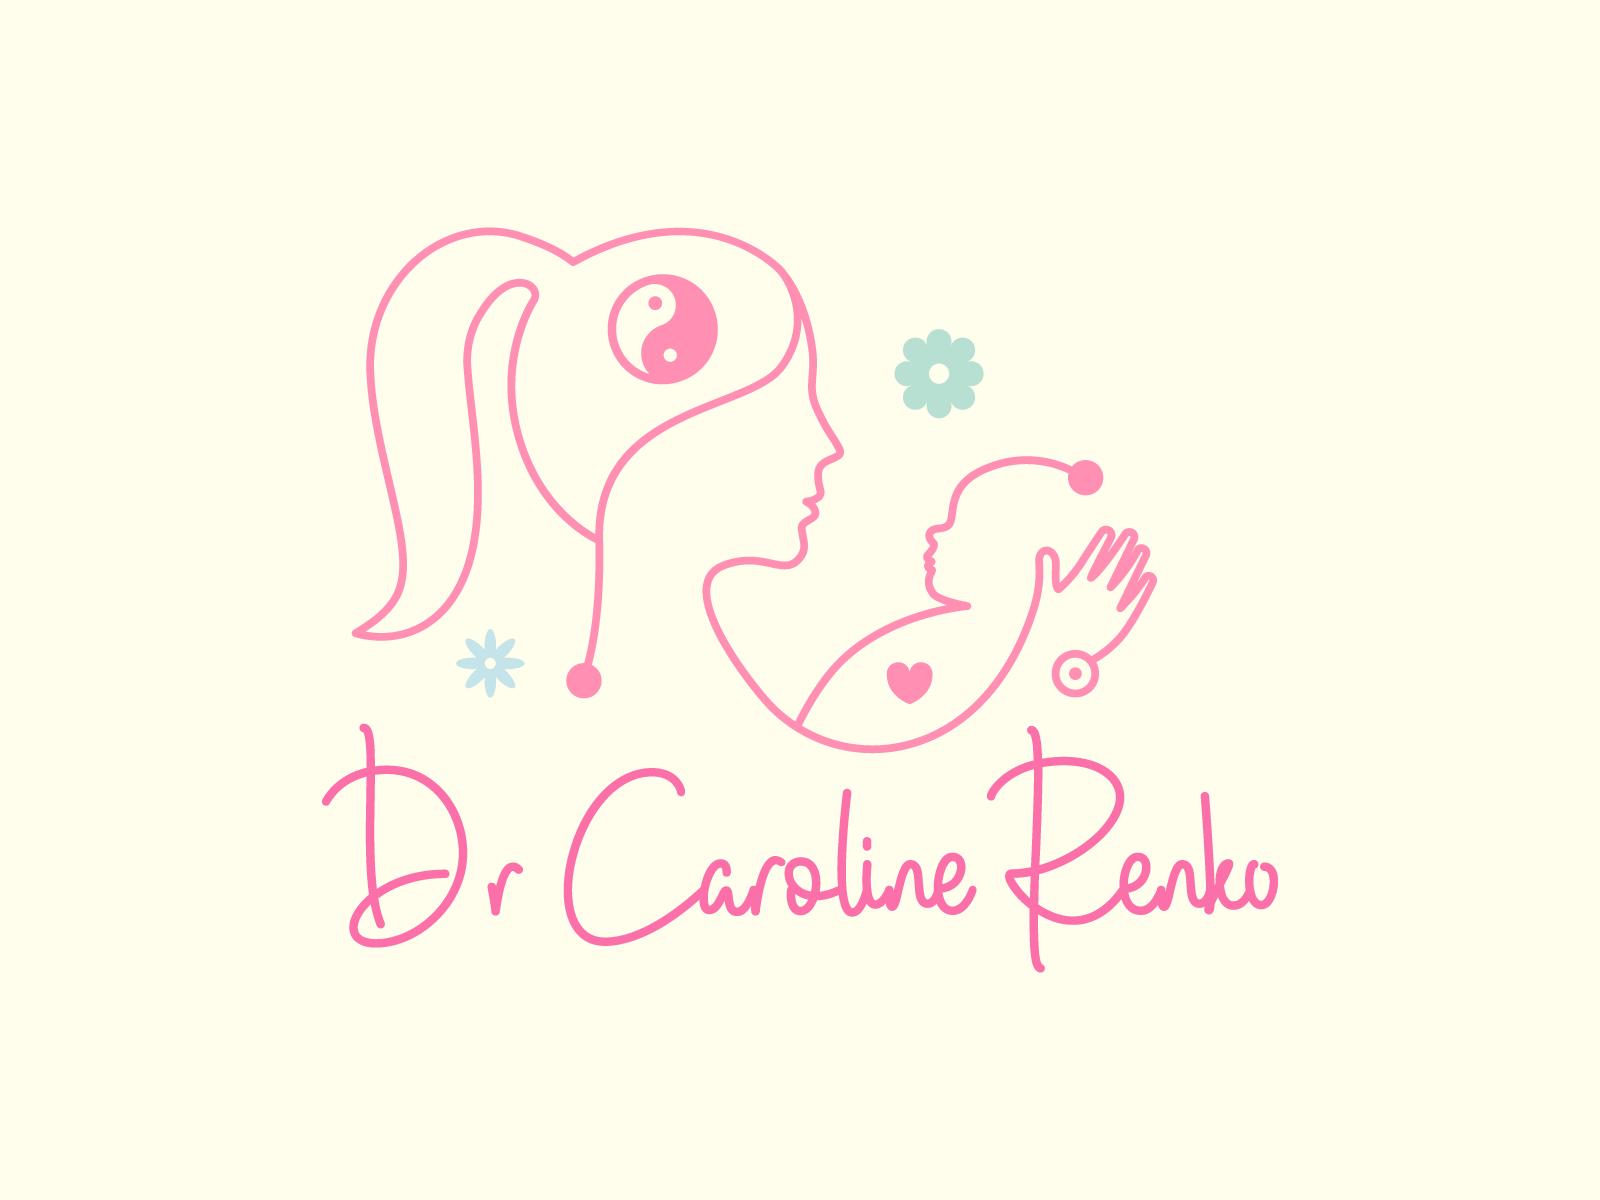 Dr Caroline Renko Logo